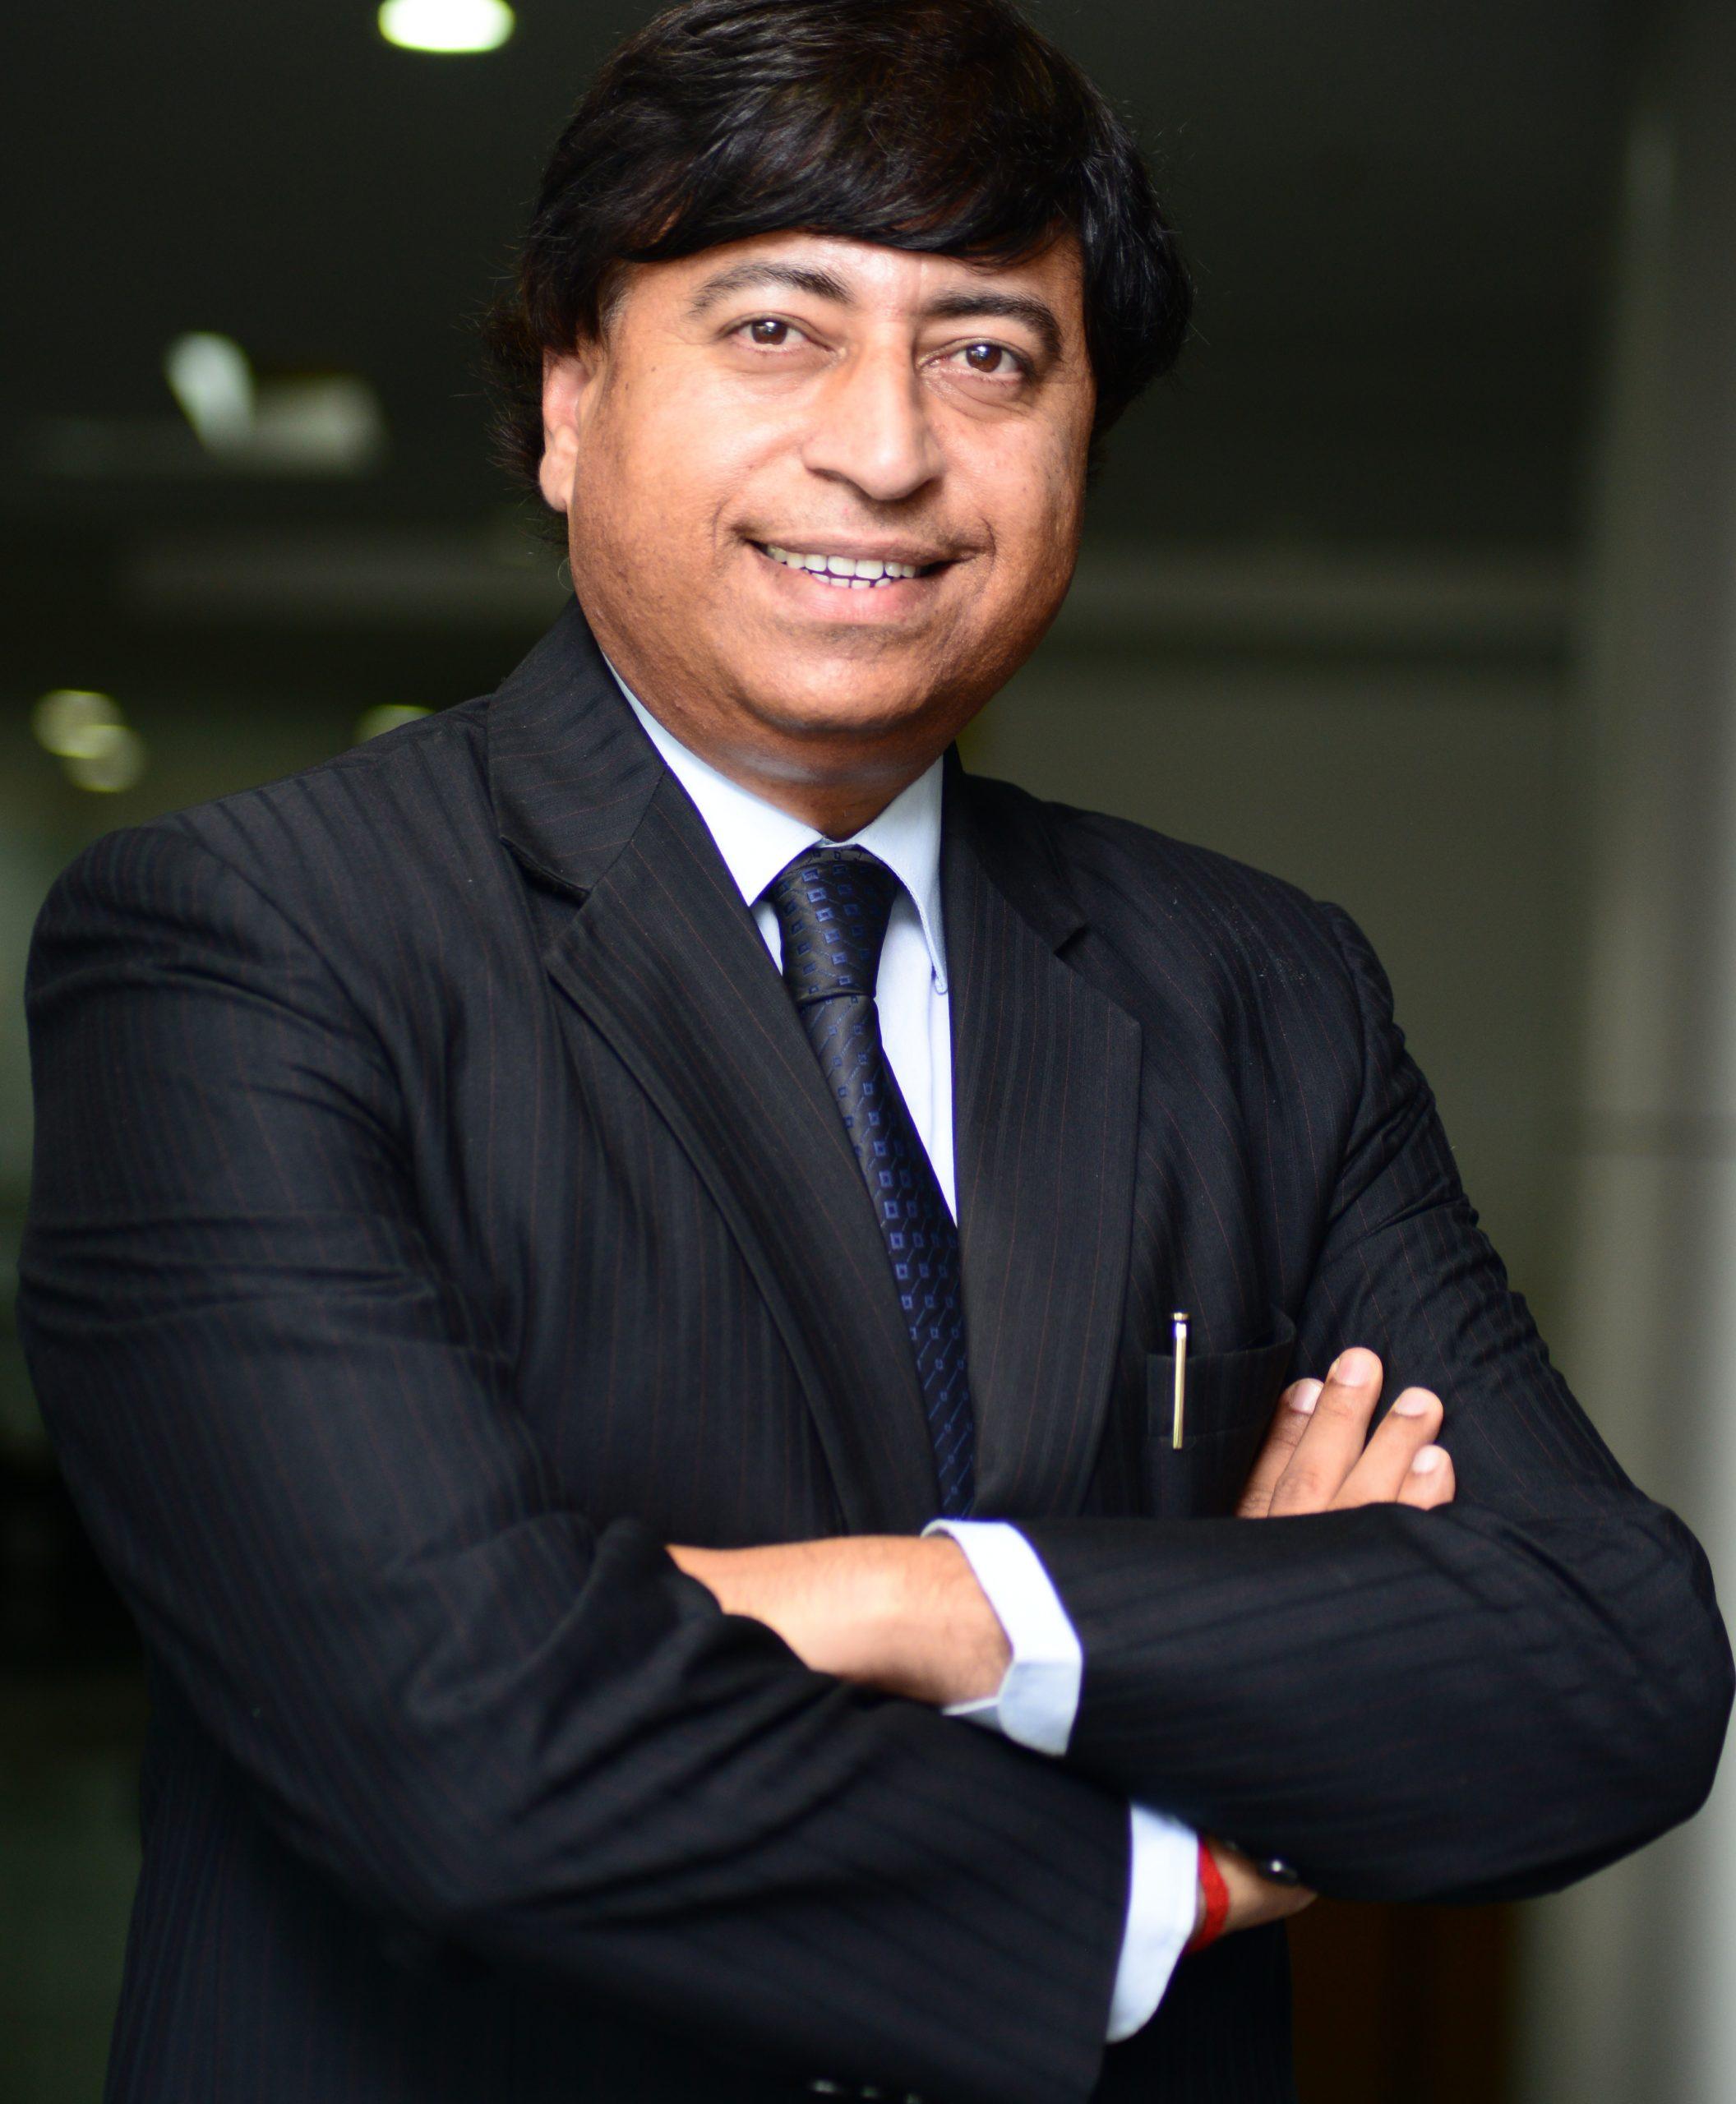 EQ in Exclusive Conversation With Mr. Rajneesh Khattar, Group Director – Energy Portfolio Informa Markets, India